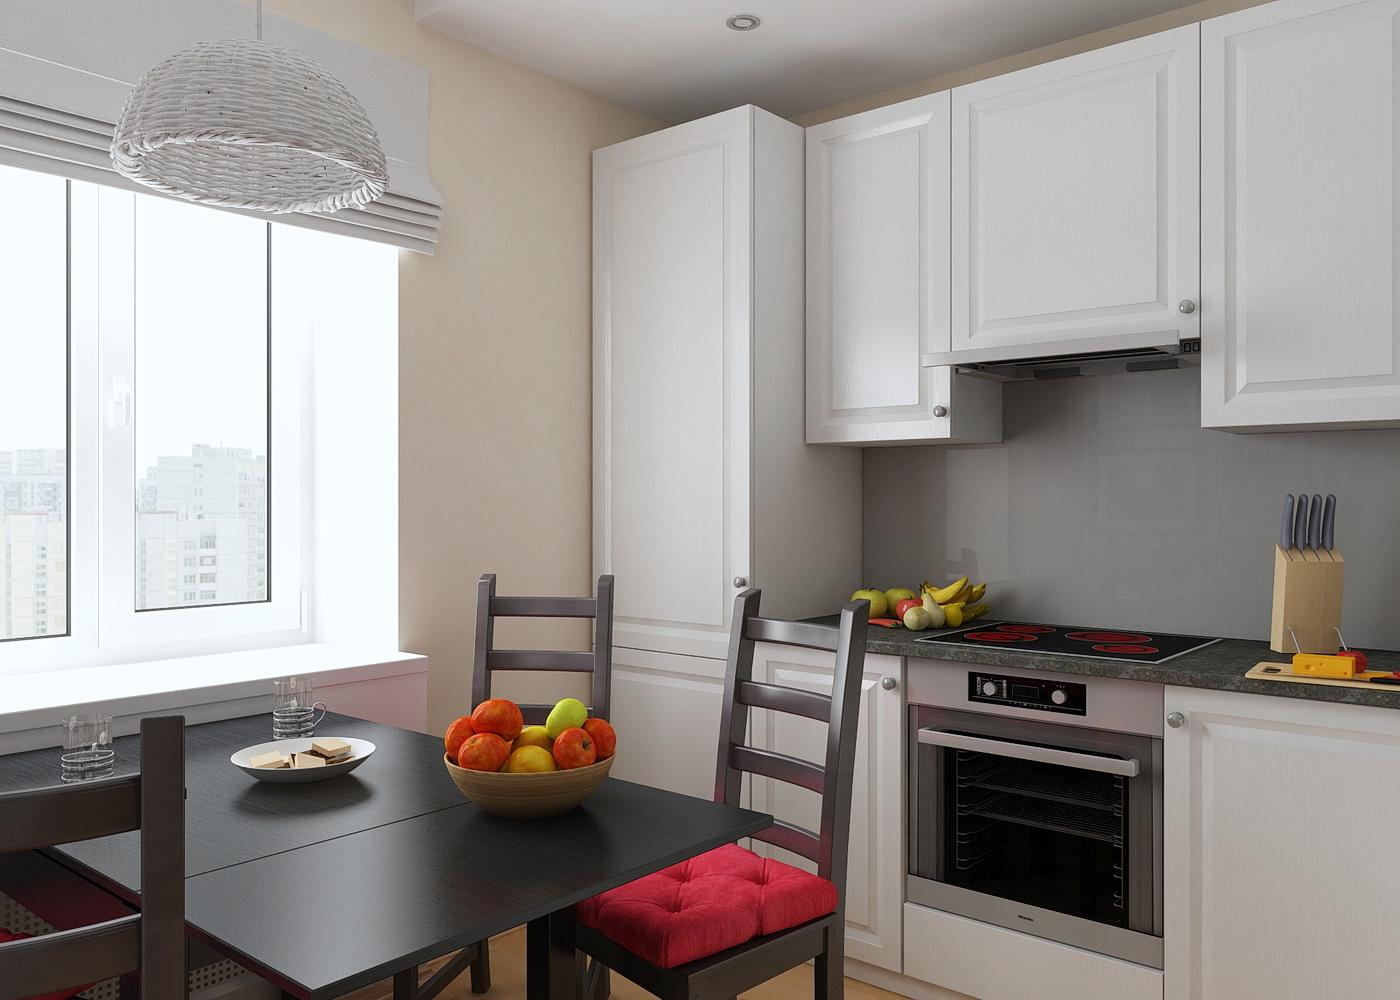 kitchen portfolio 2015-12-13 22462000000.jpg